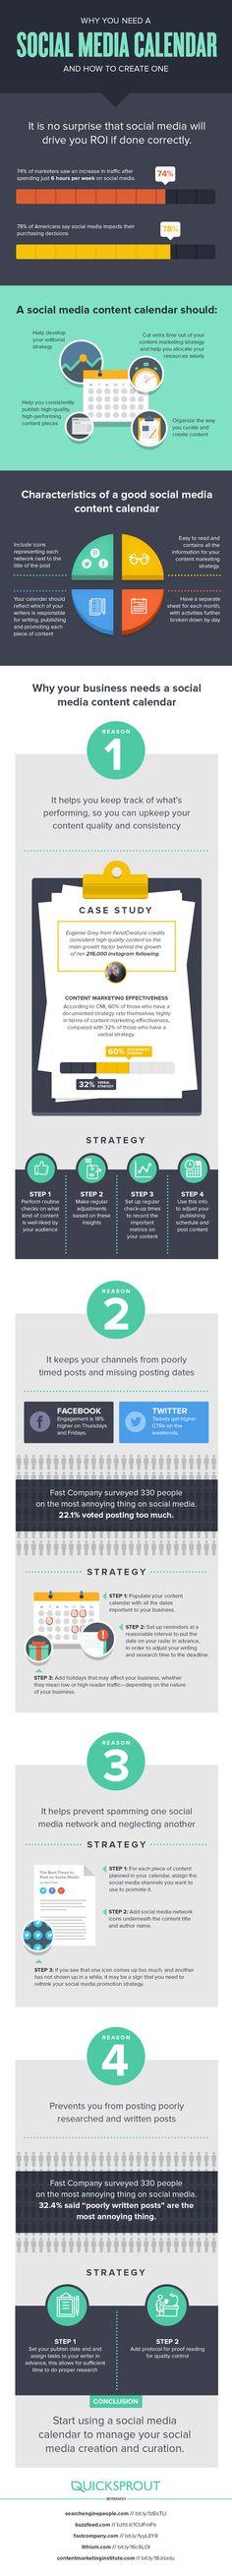 How to Create a Social Media Calendar [Infographic], via @HubSpot